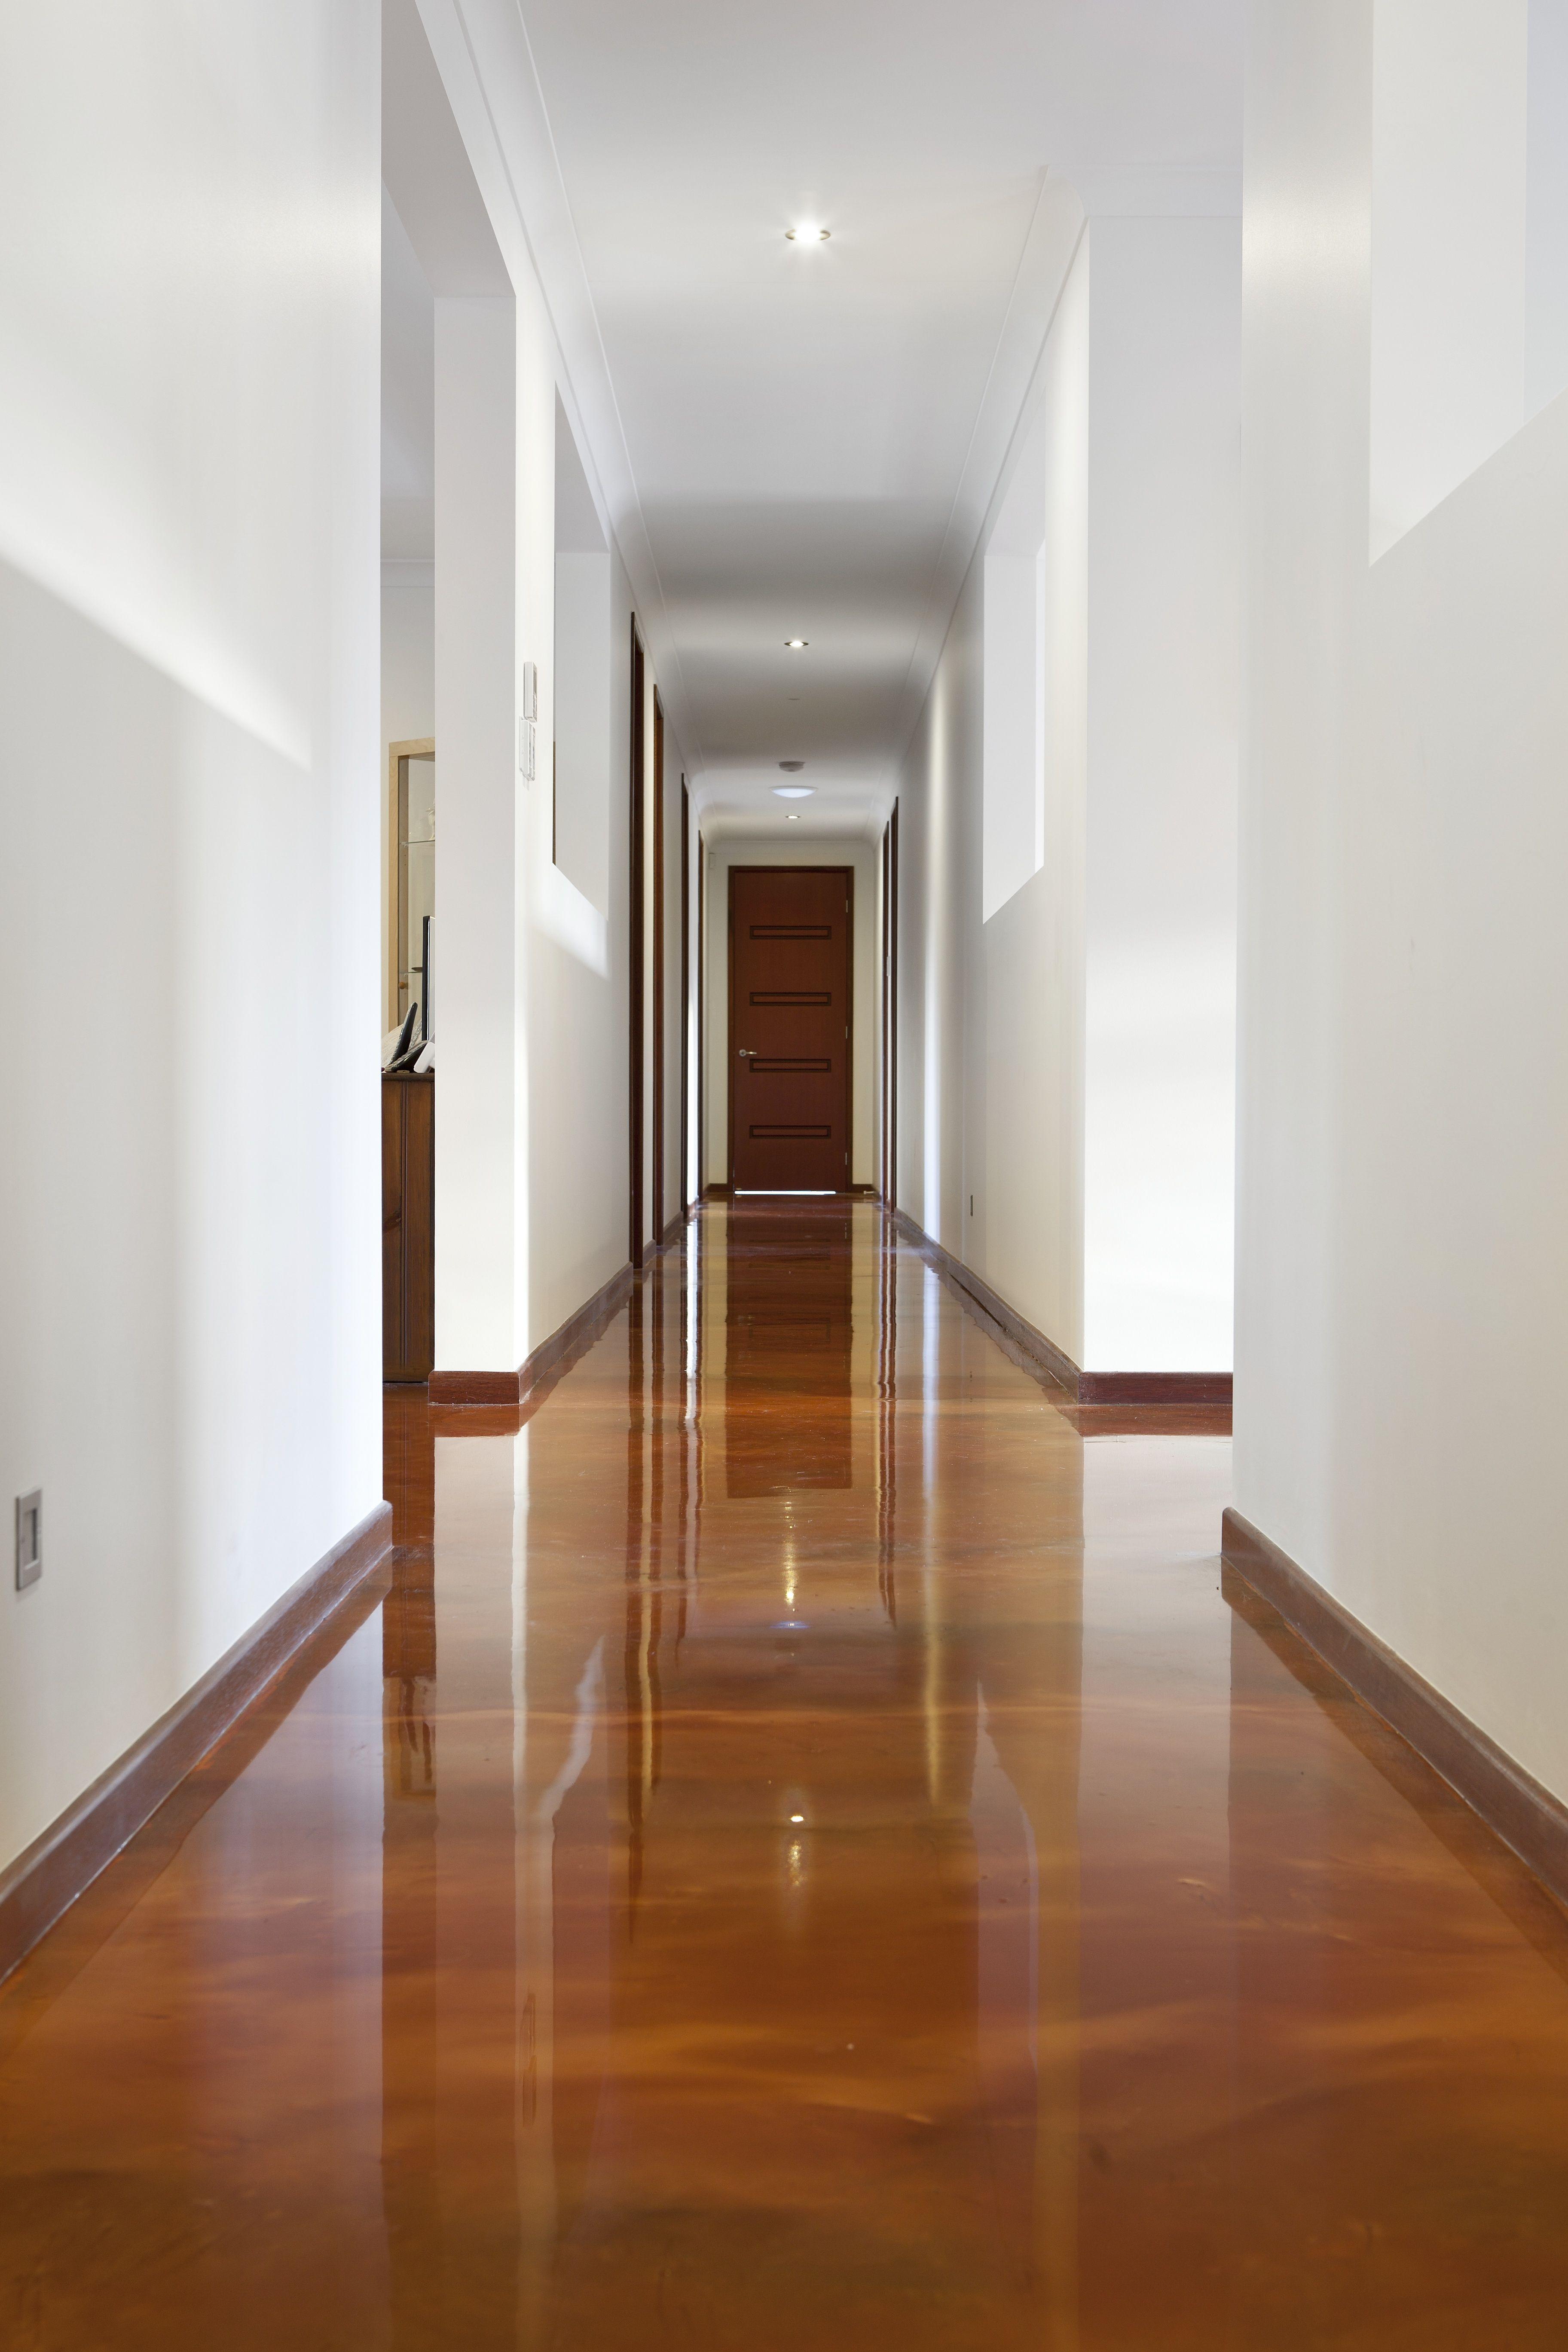 Concrete coatings and concrete floors. Polished concrete